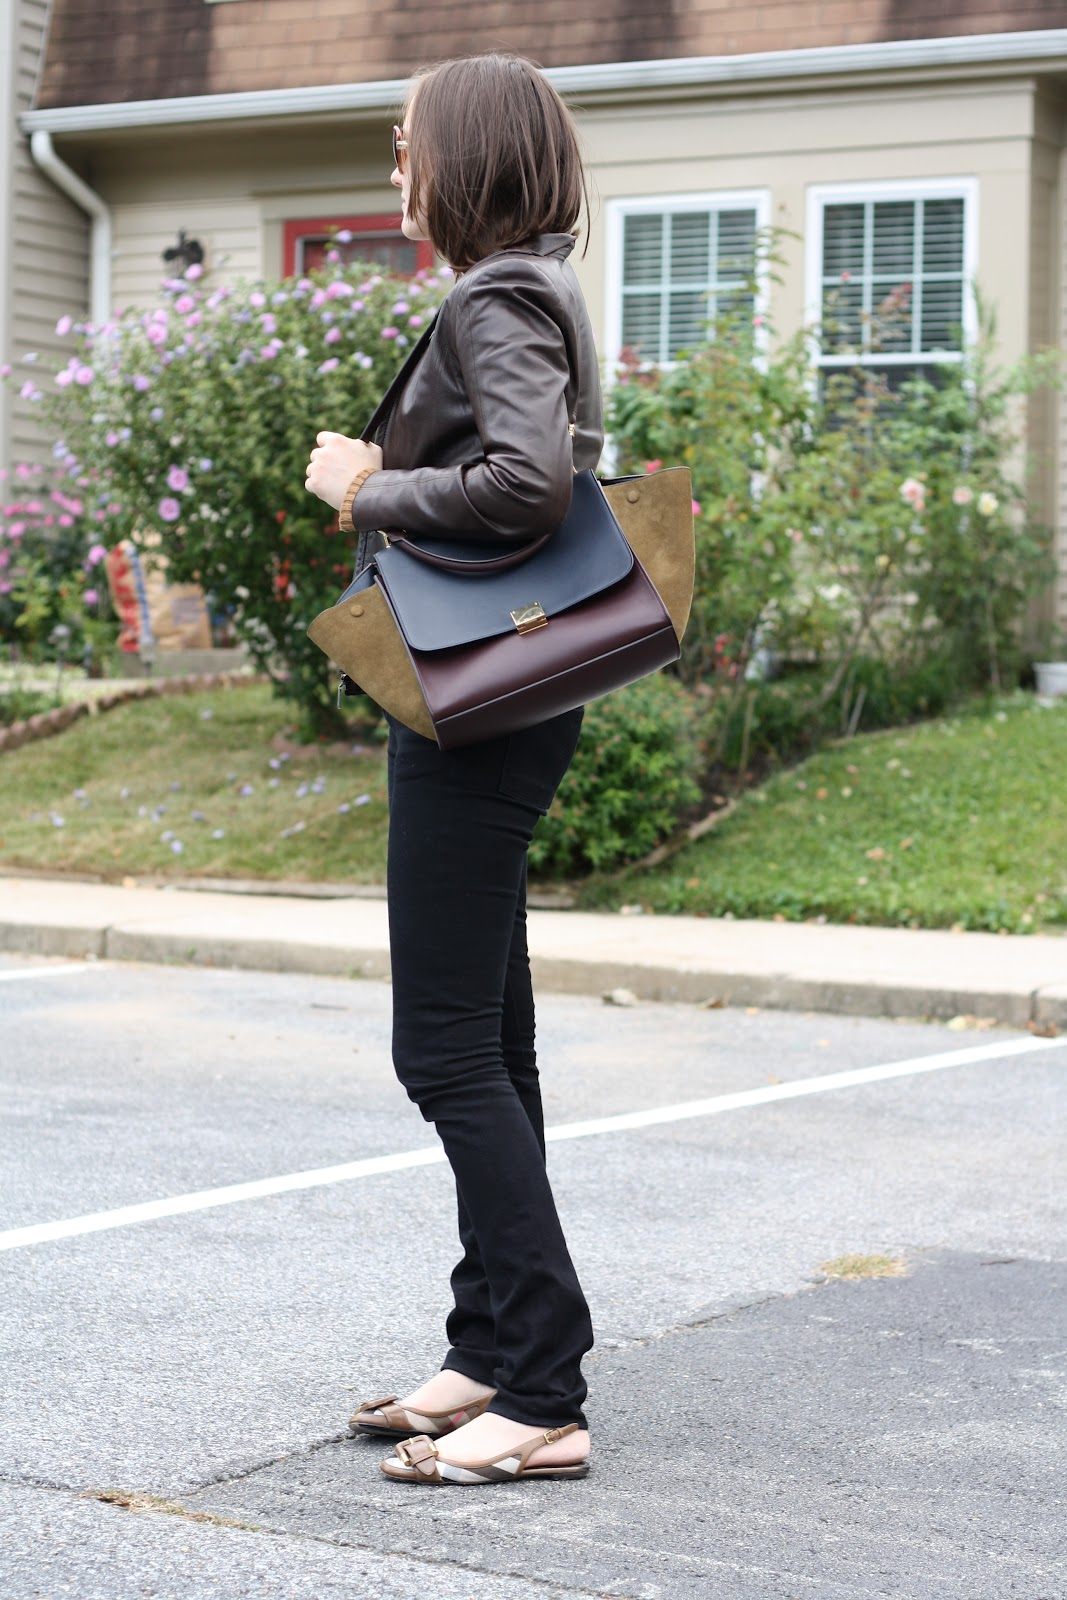 buy celine luggage bag online - Thrifty Business: September 2012